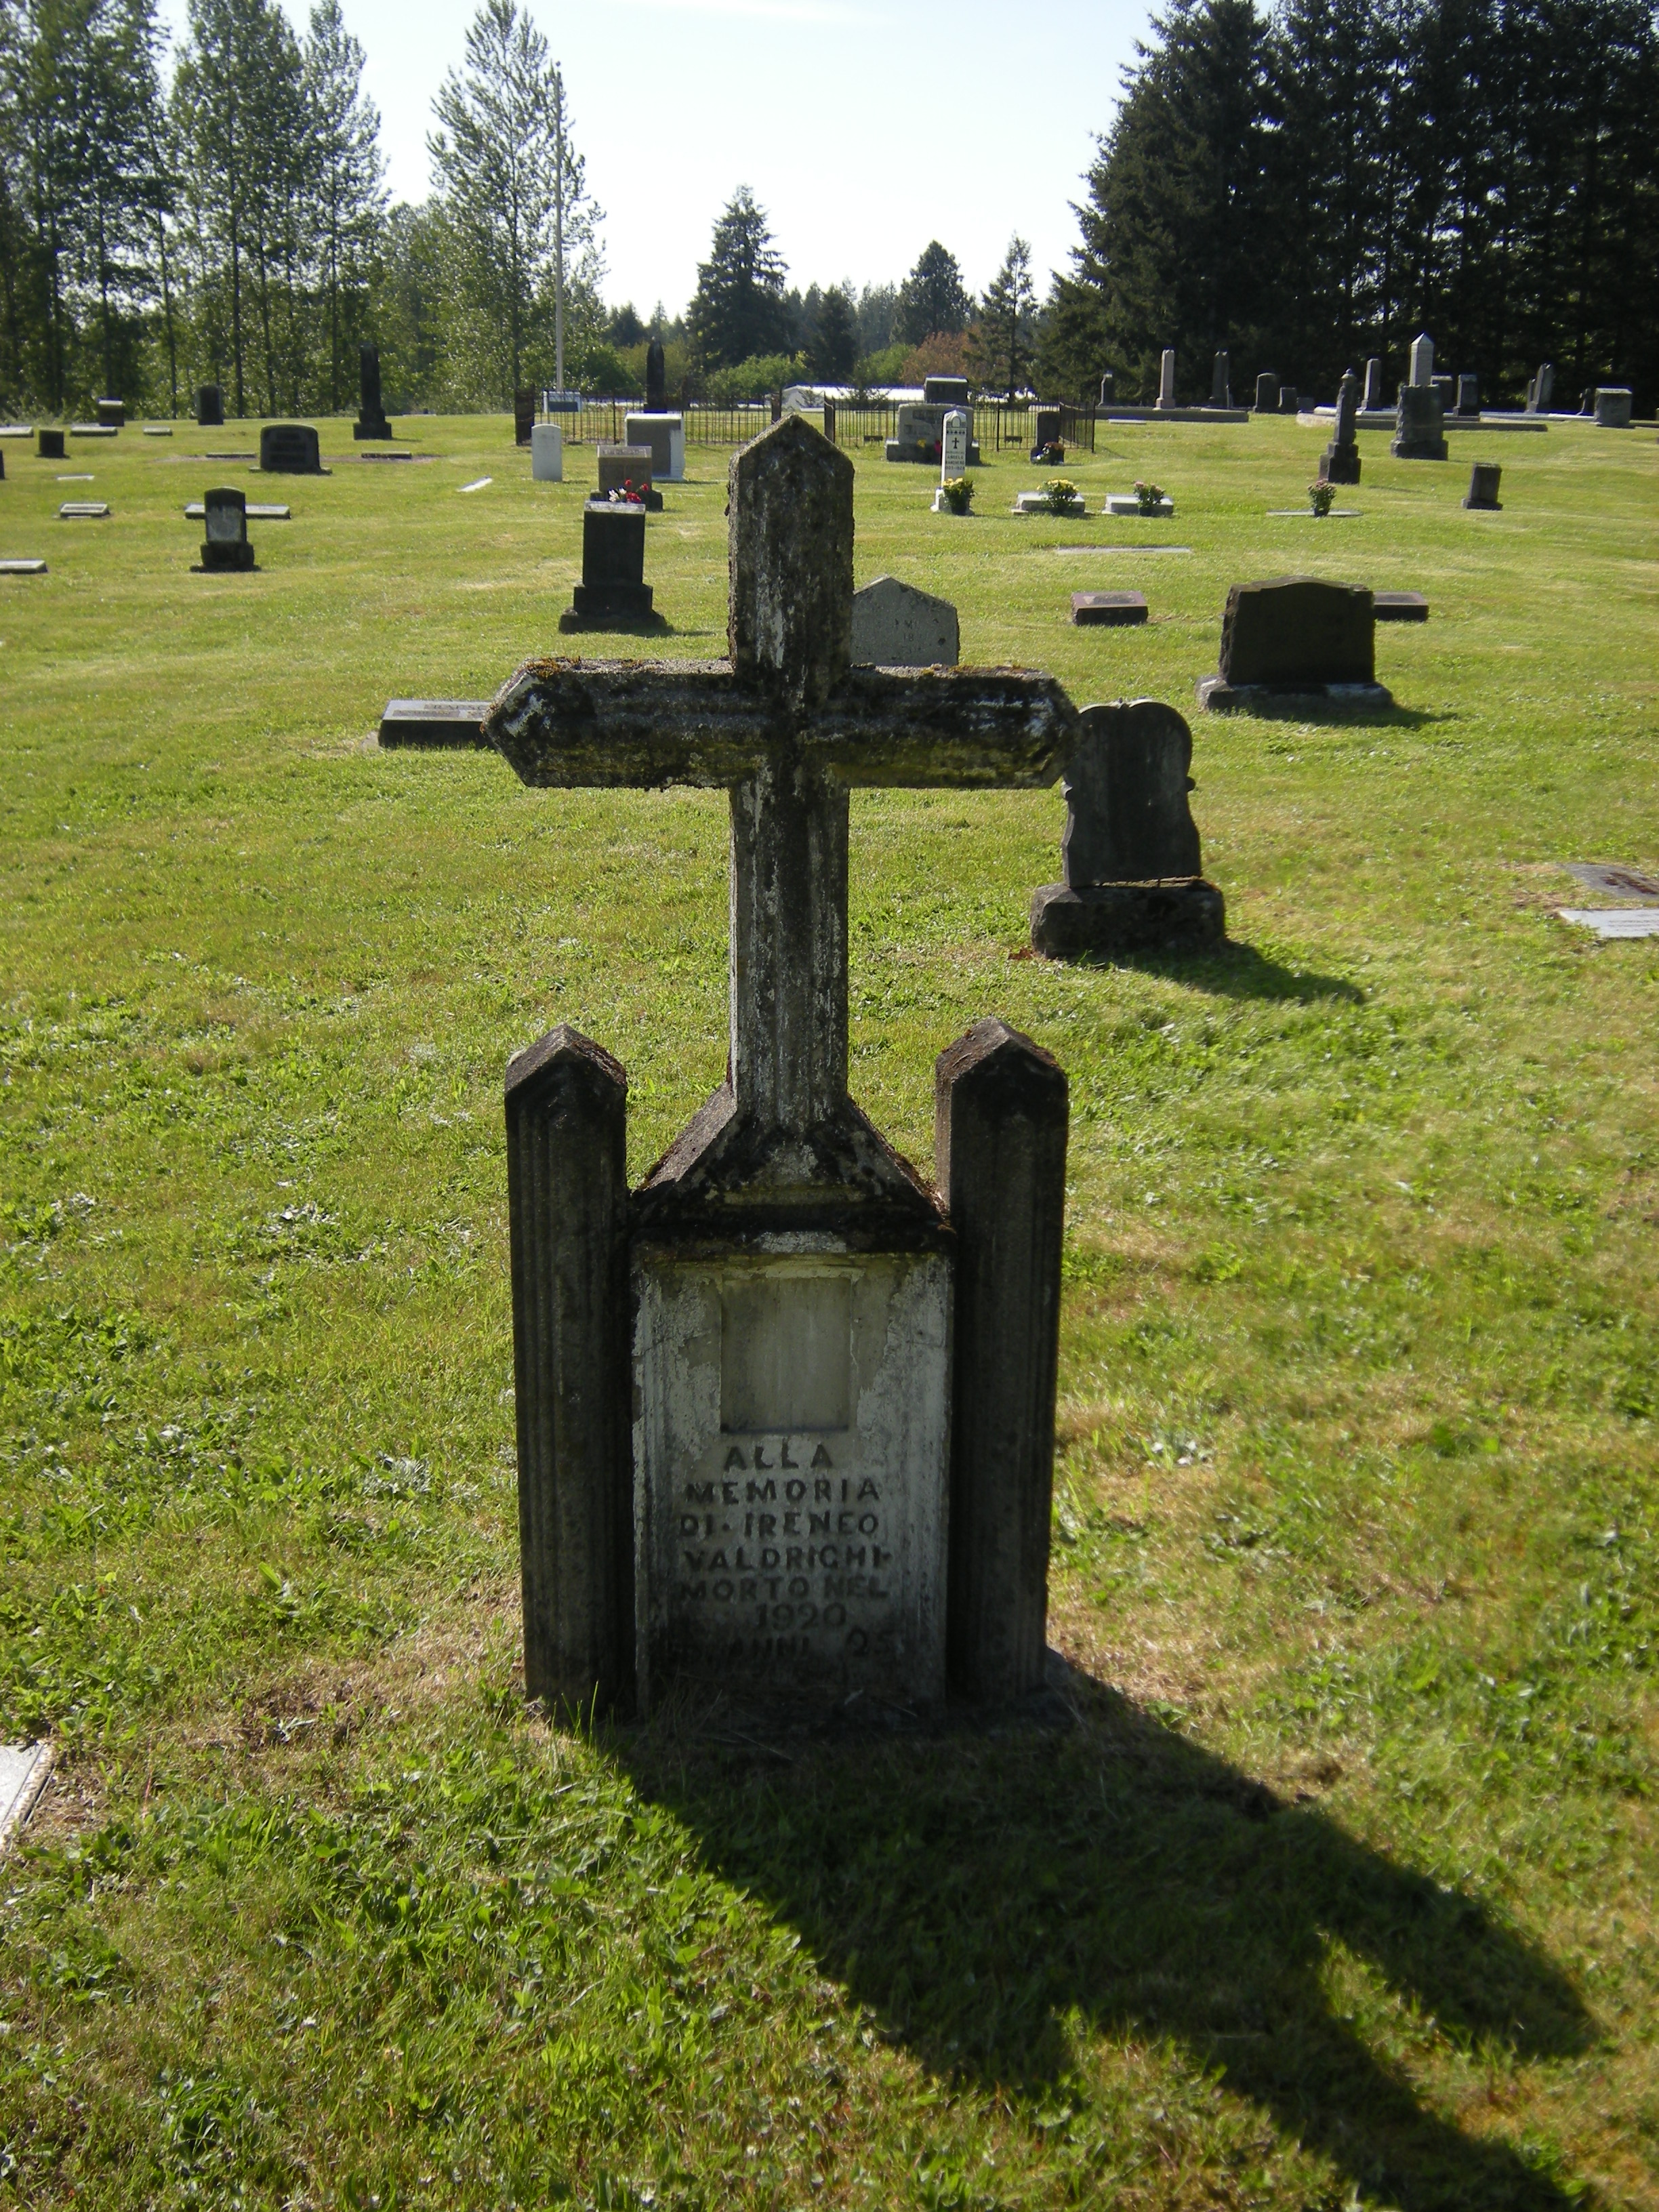 Gravestone with cross on top